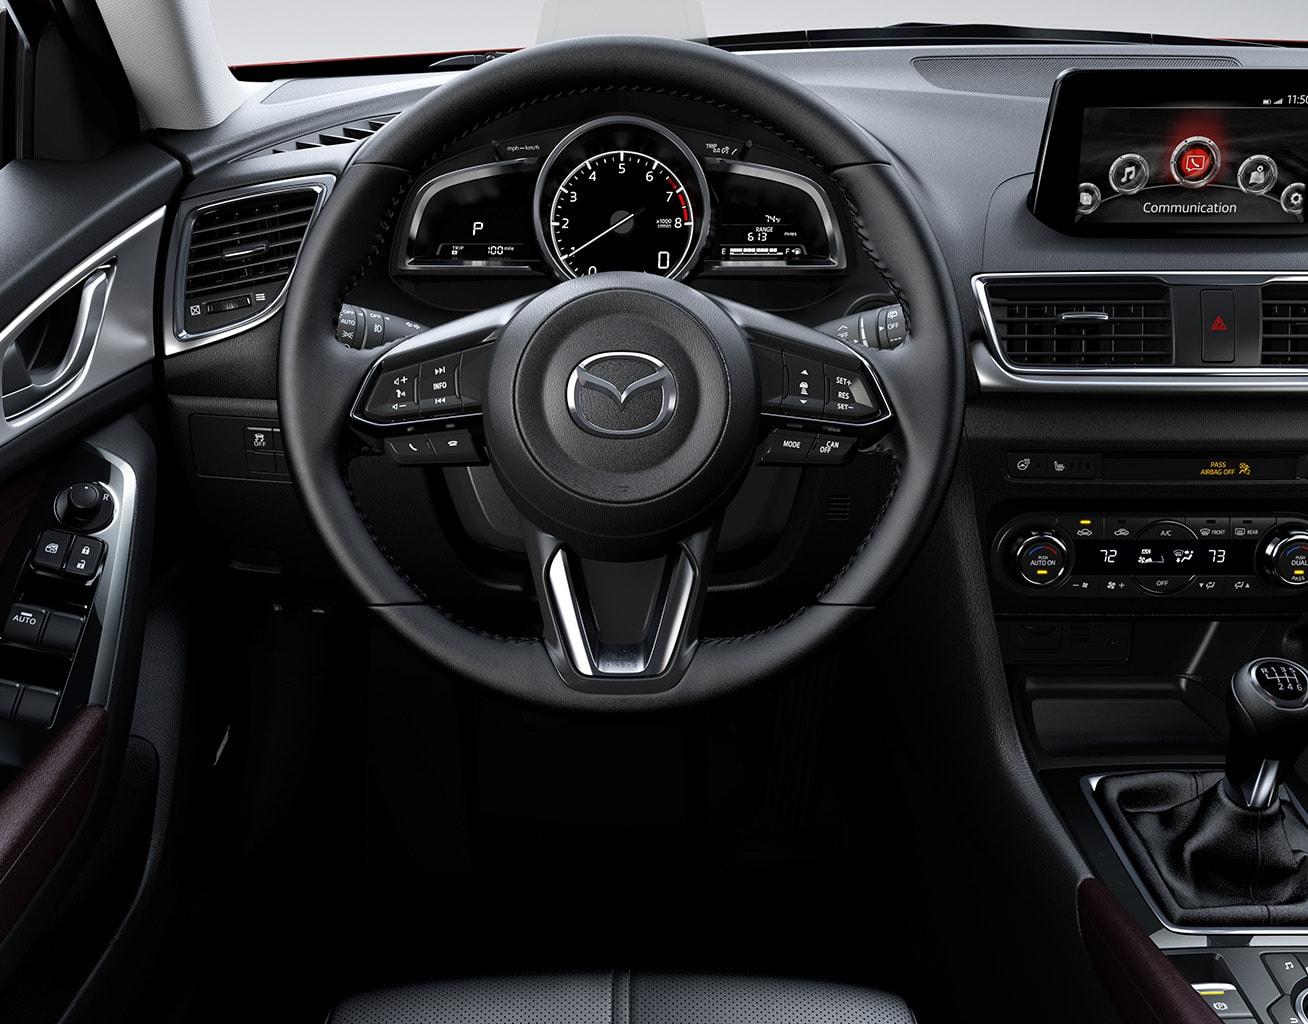 2017 Mazda 3 Hatchback Fuel Efficient Compact Car